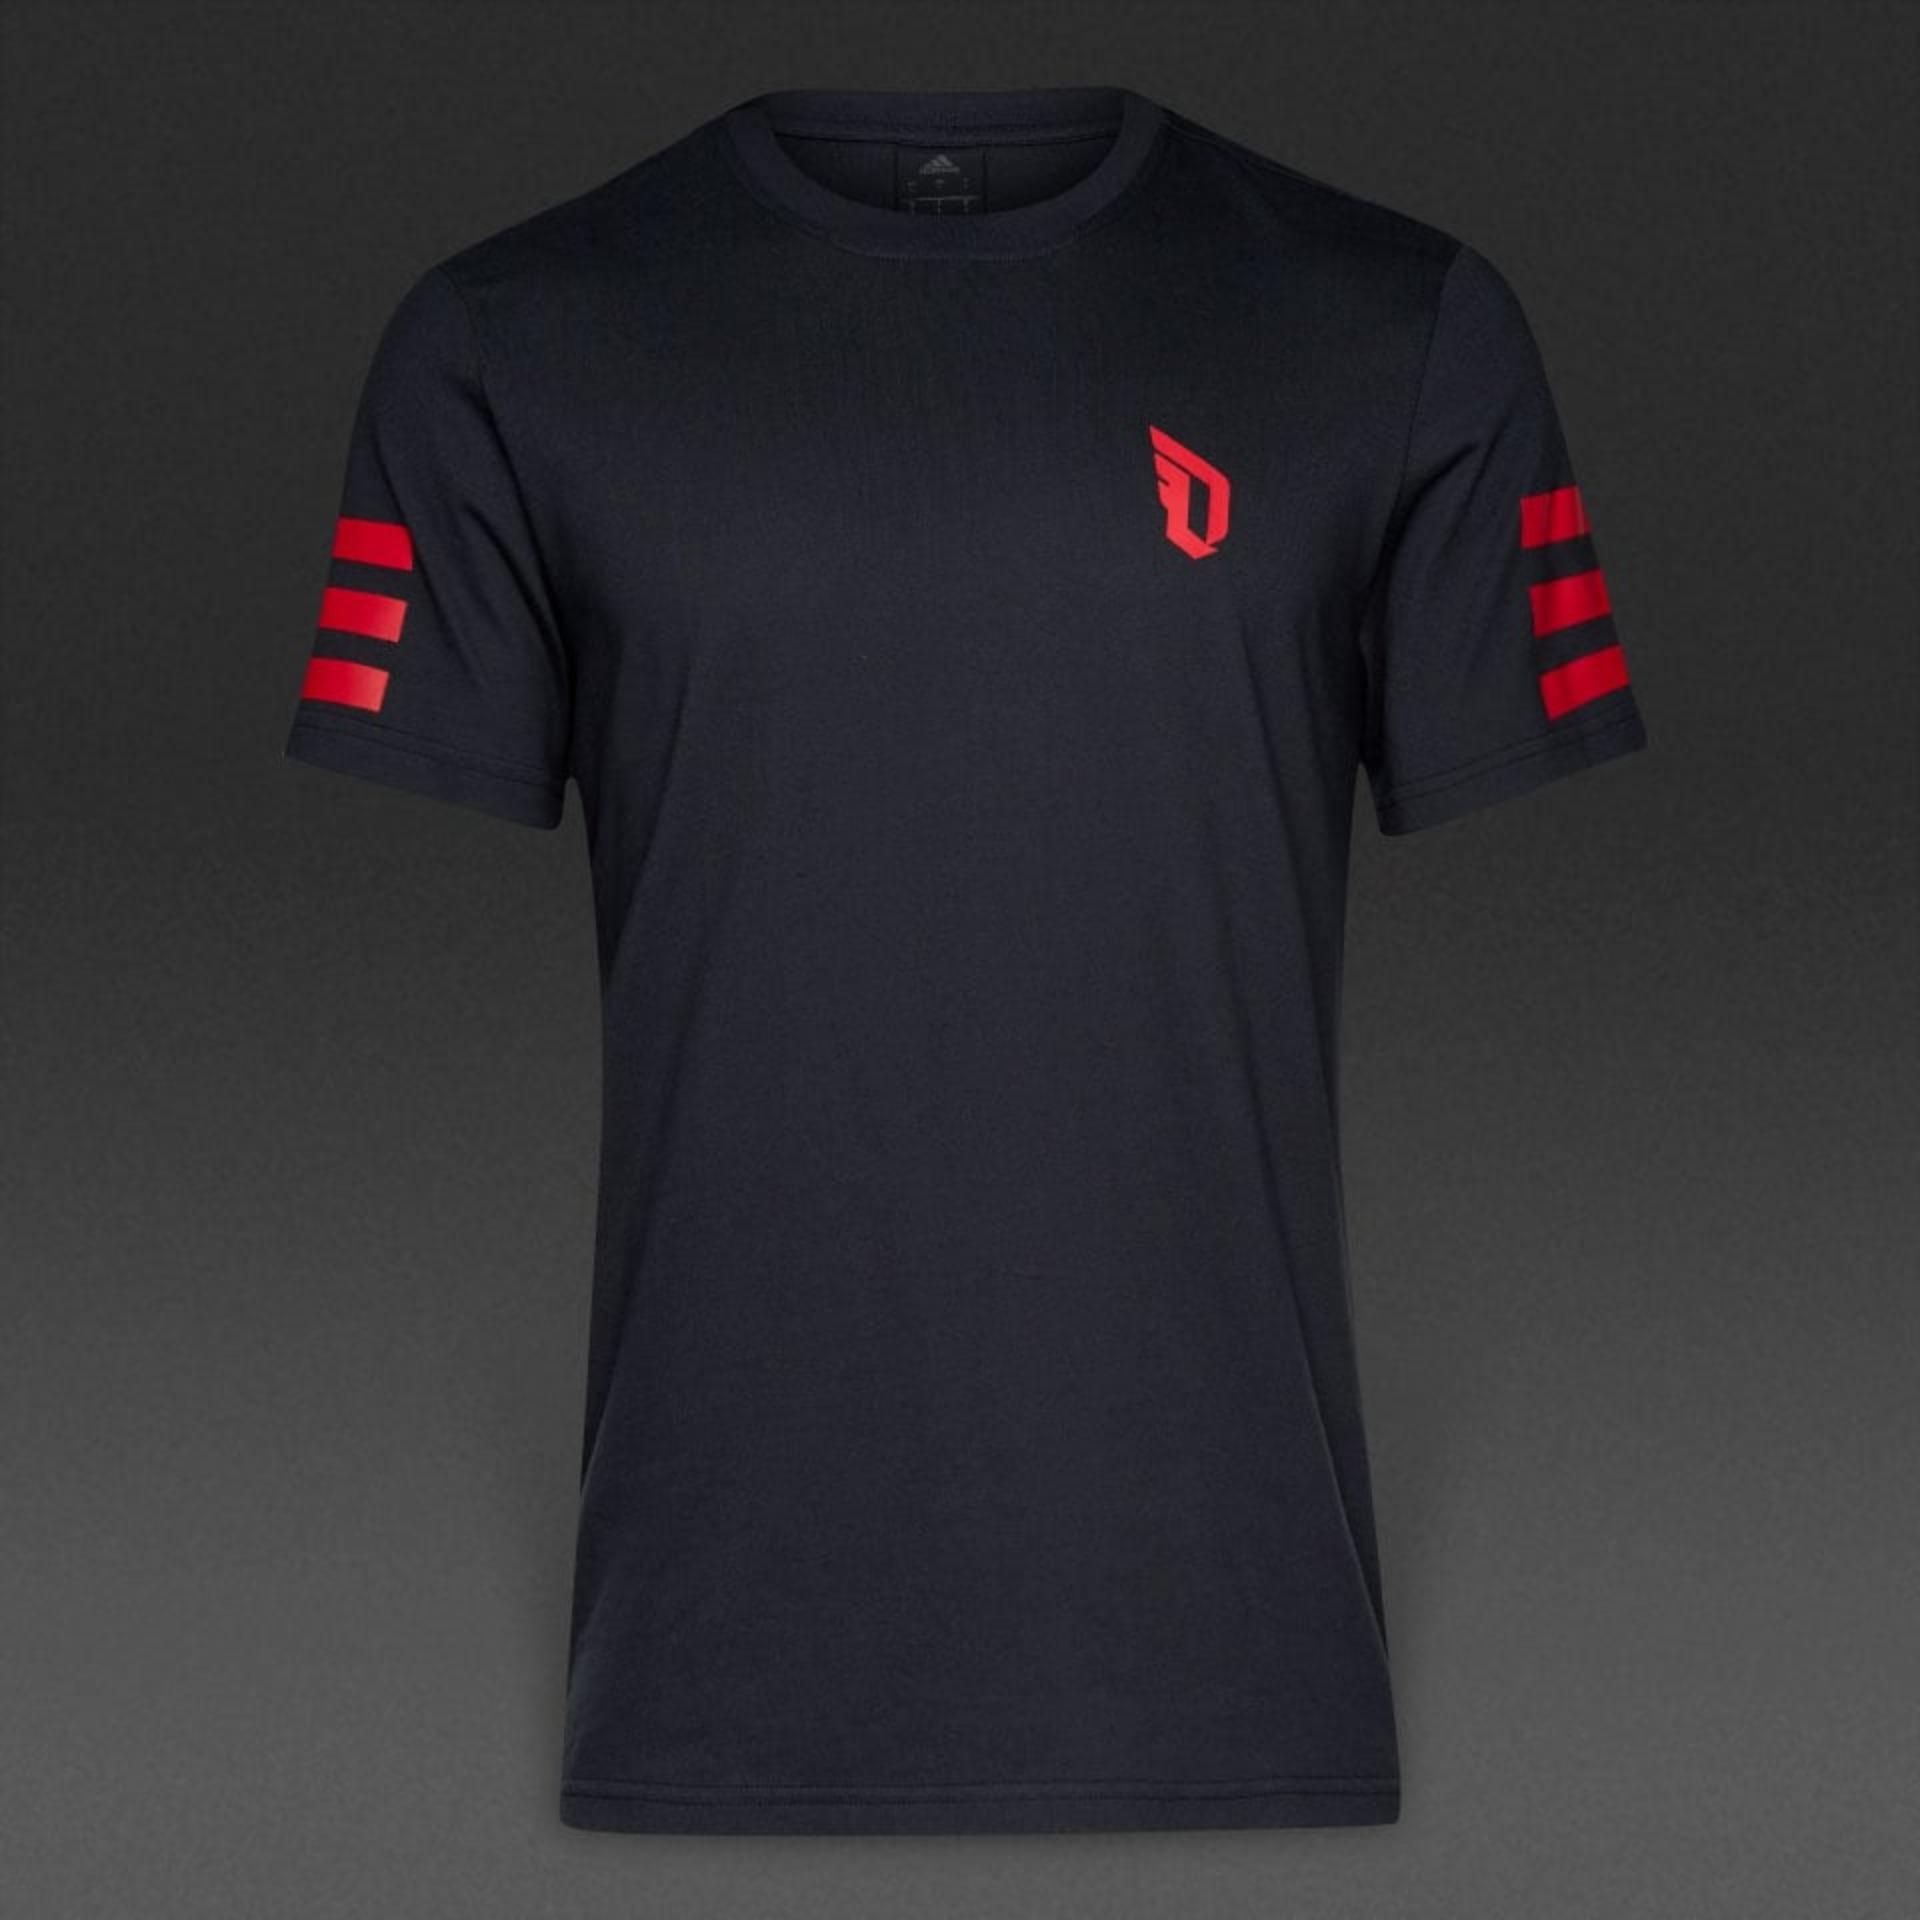 Adidas kaos Dame stripe Tee - BJ9616 - hitam